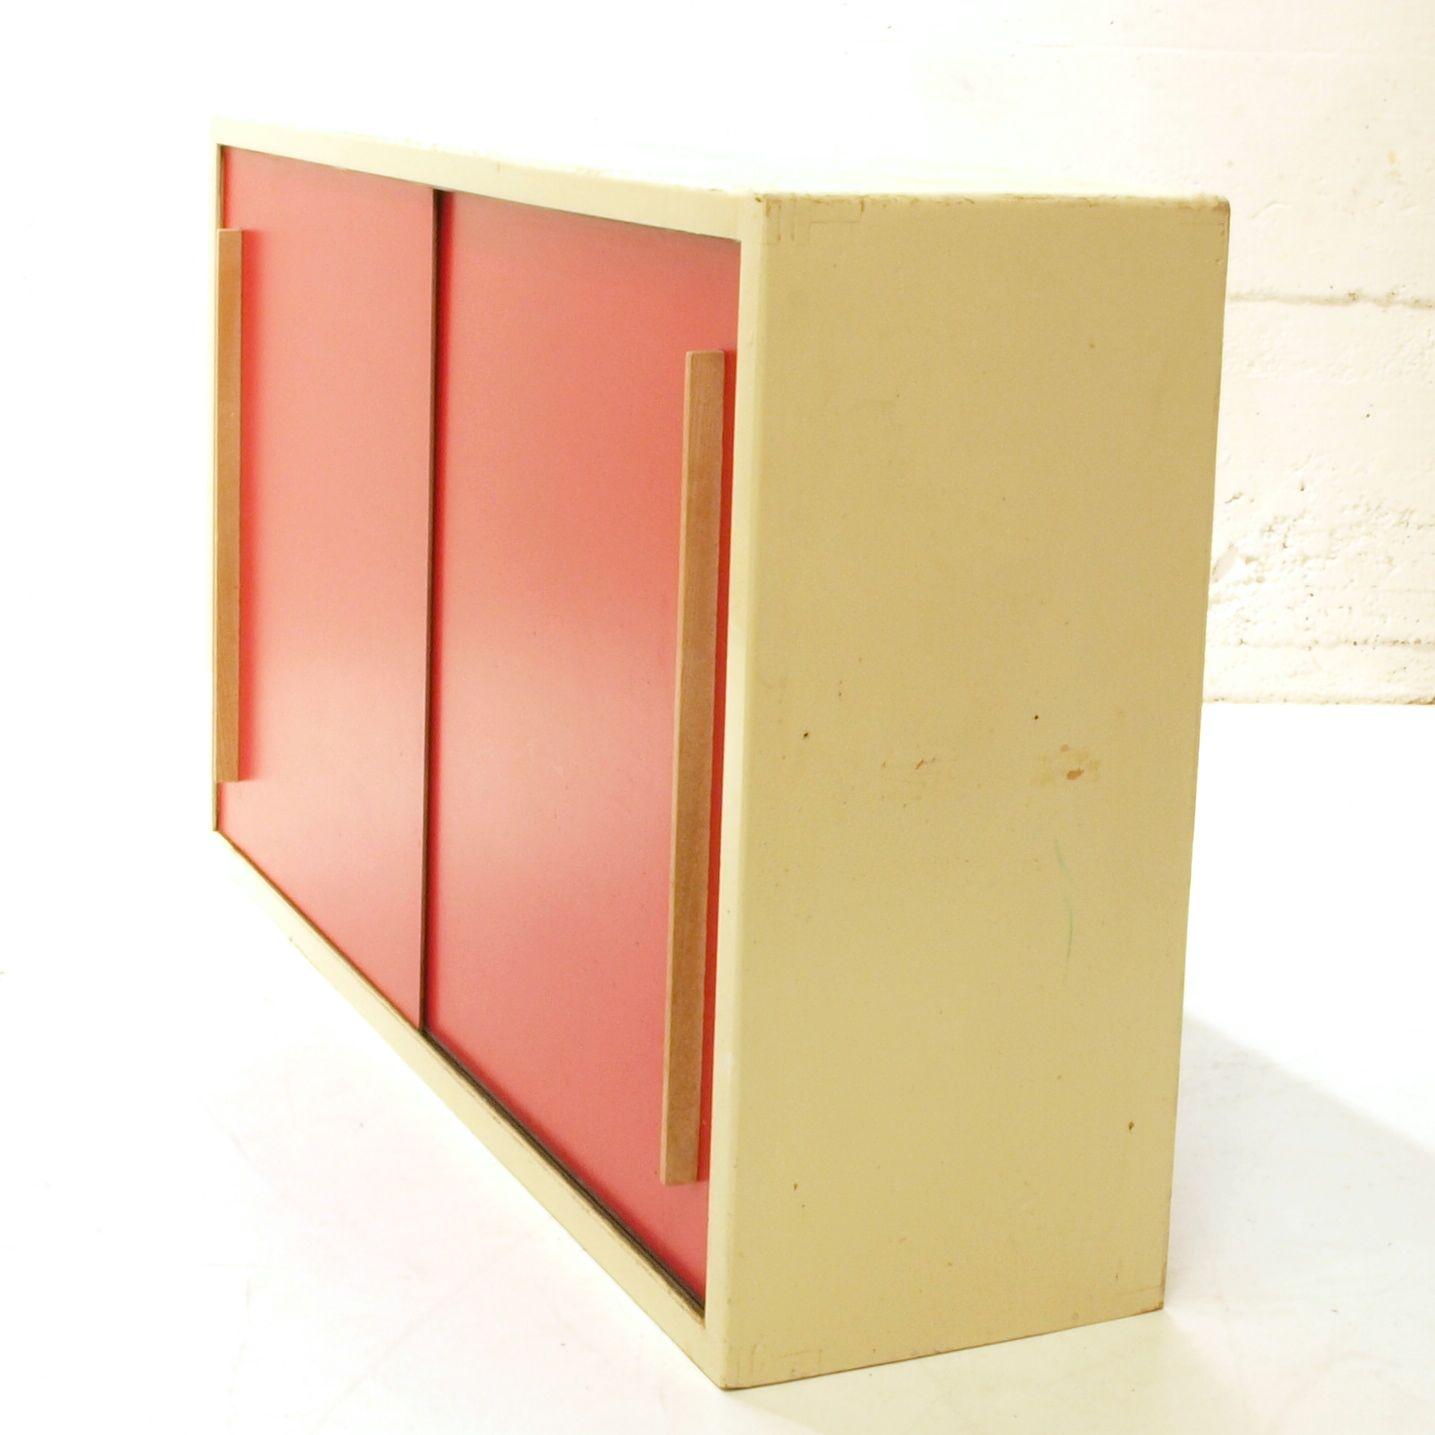 schiebeschrank weiss rot m bel z rich vintagem bel. Black Bedroom Furniture Sets. Home Design Ideas